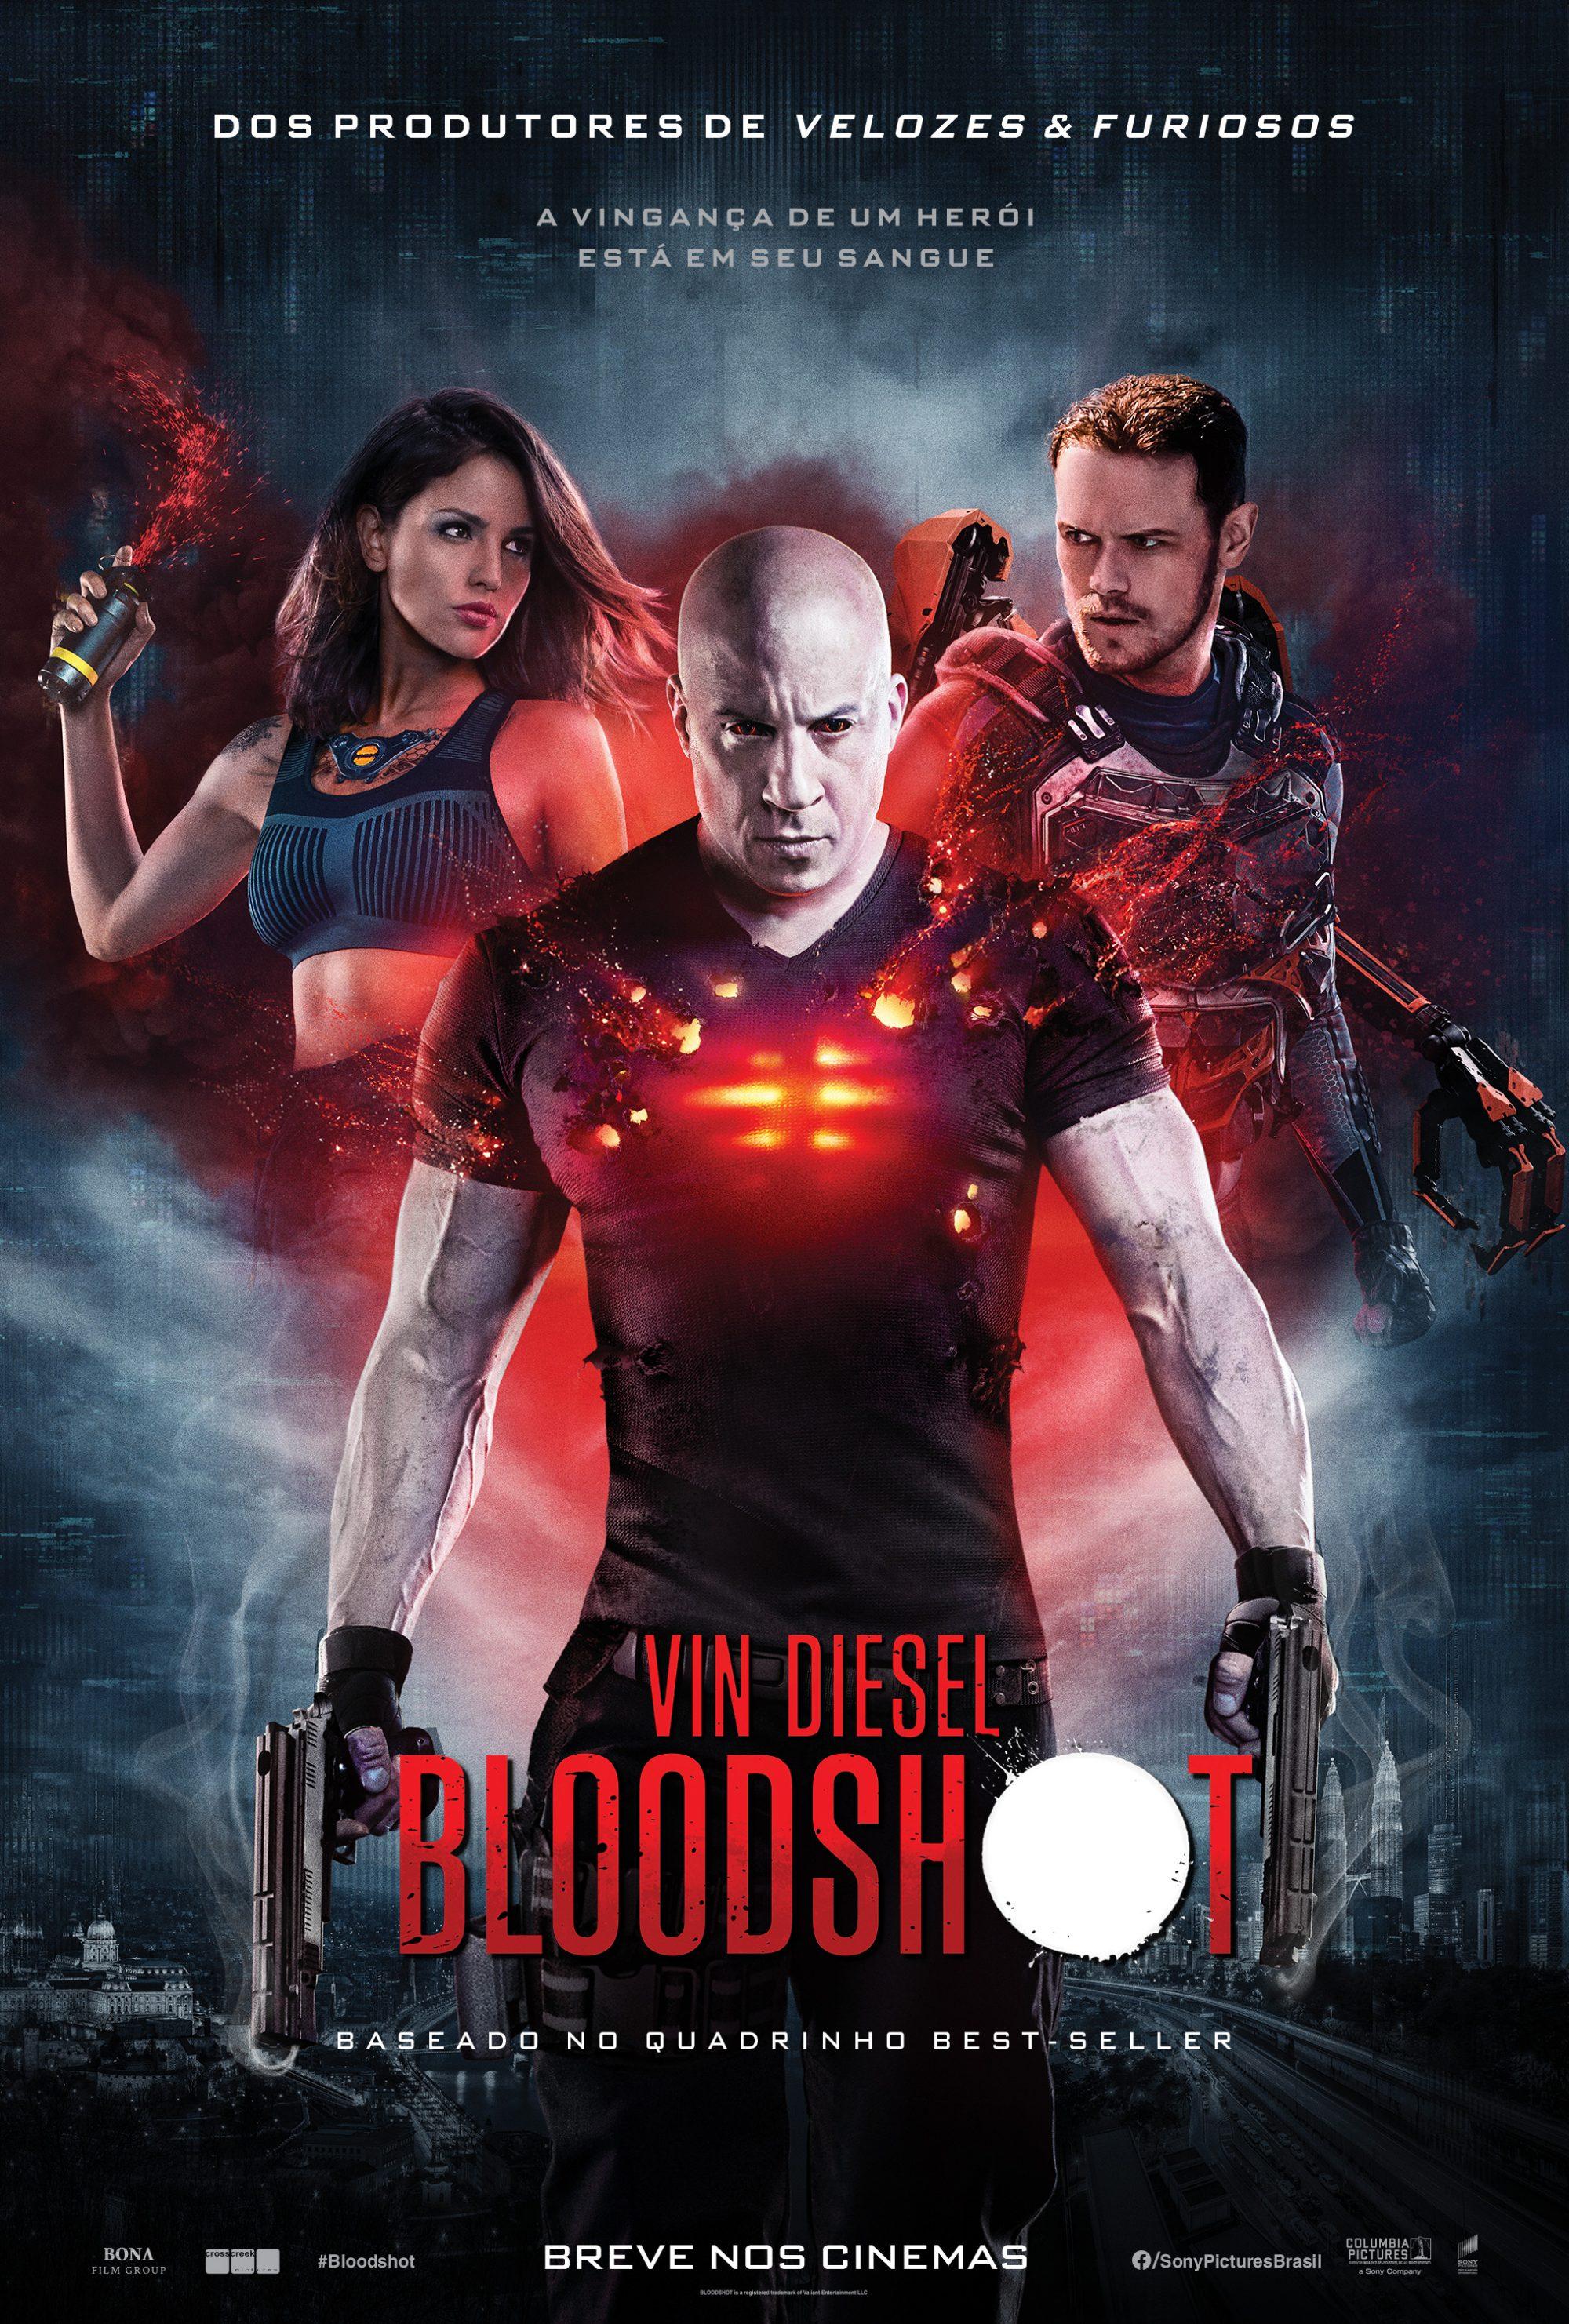 BLOODSHOT, da Sony Pictures, ganha cartaz oficial